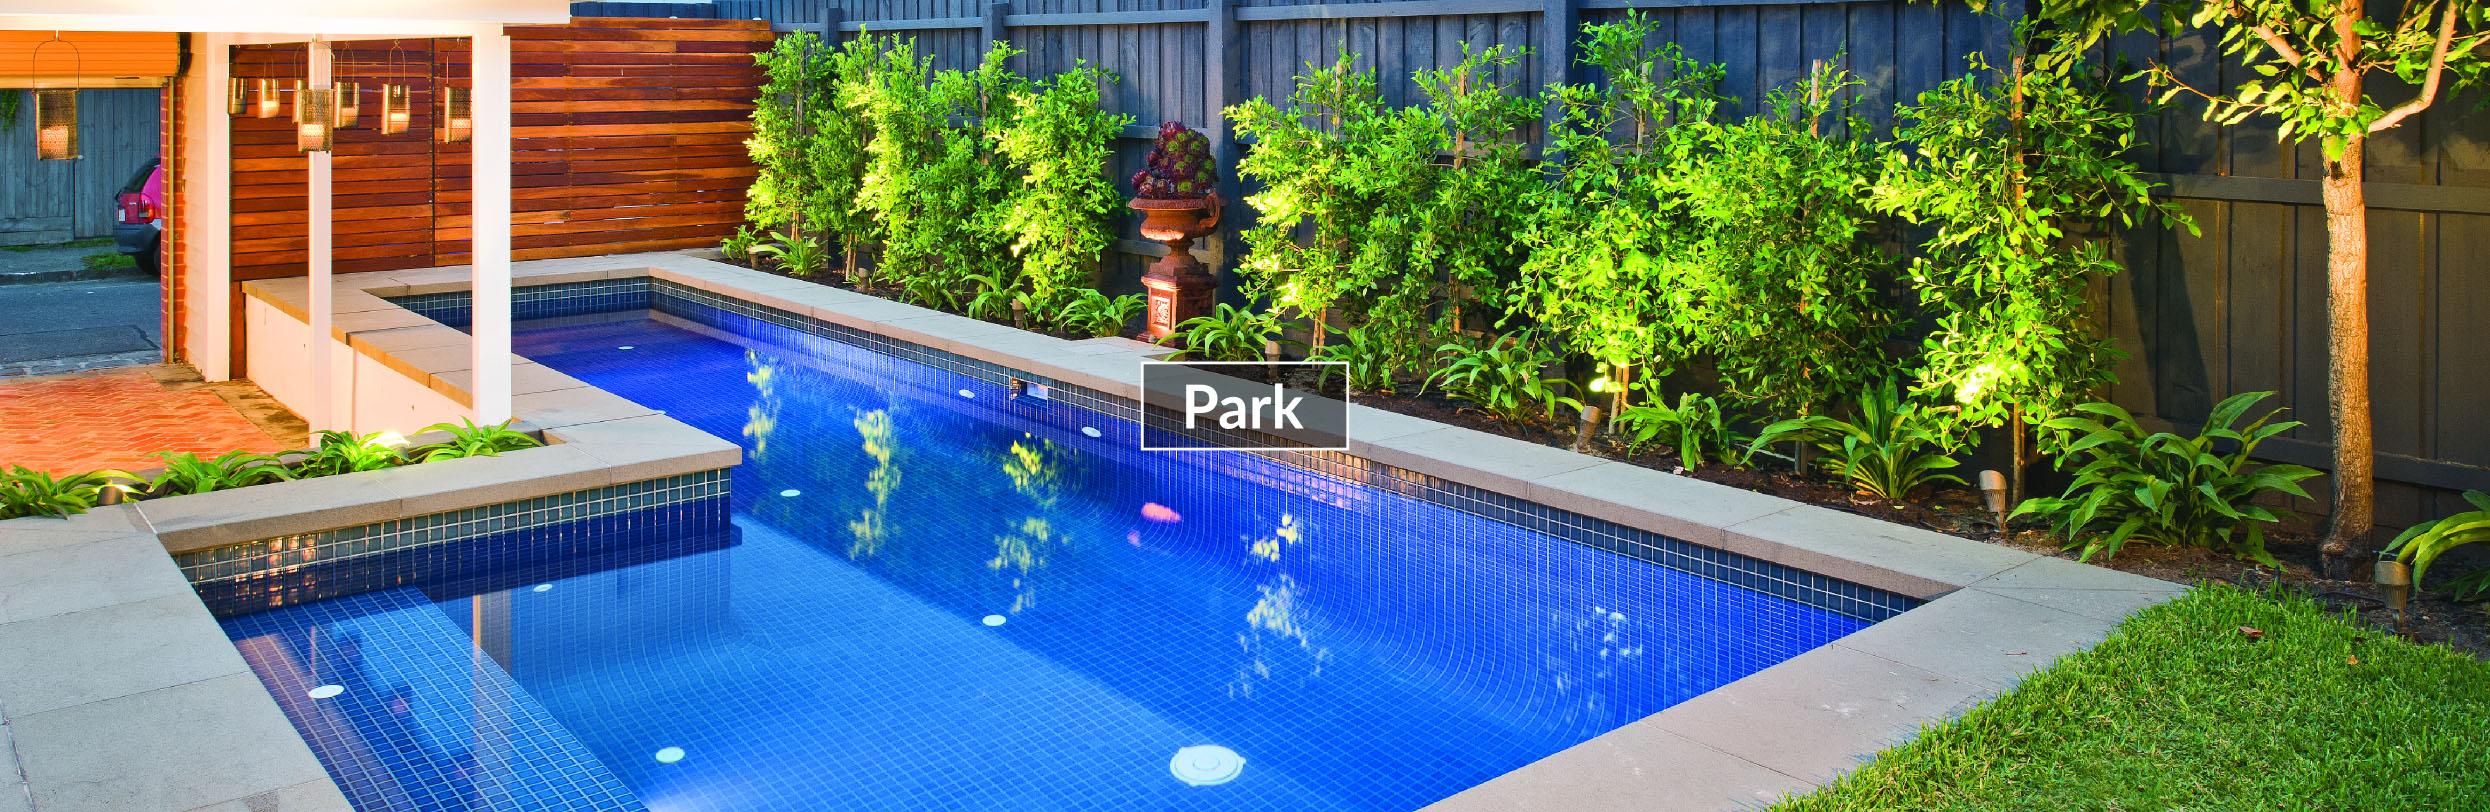 Park - Kiama Pools Small Swimming Pool Project